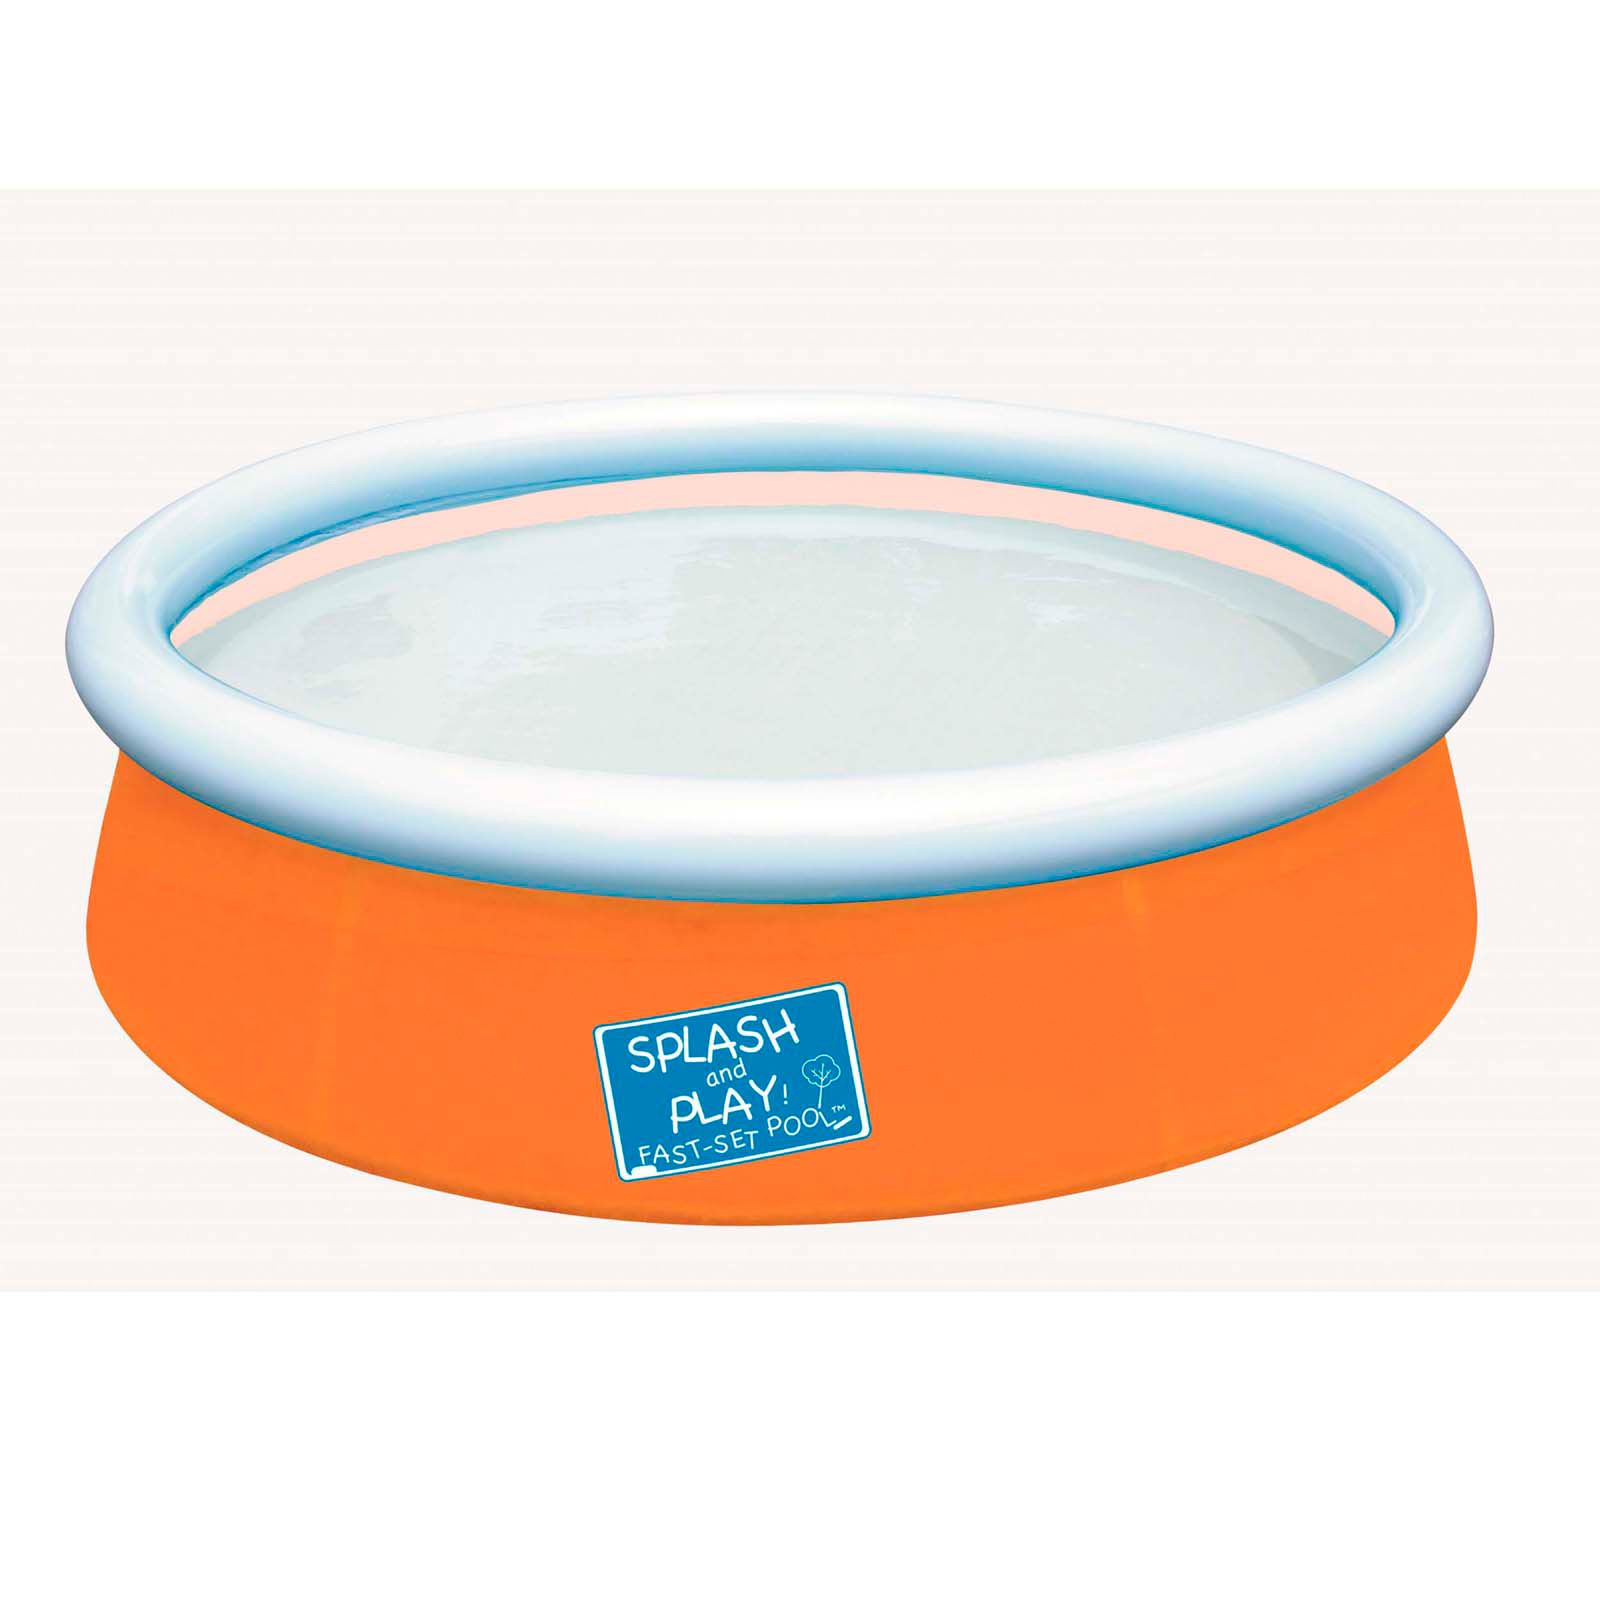 Bestway My First Fast Set Orange Pool Toys Games Swimming Pools Accessories Swimming Pools